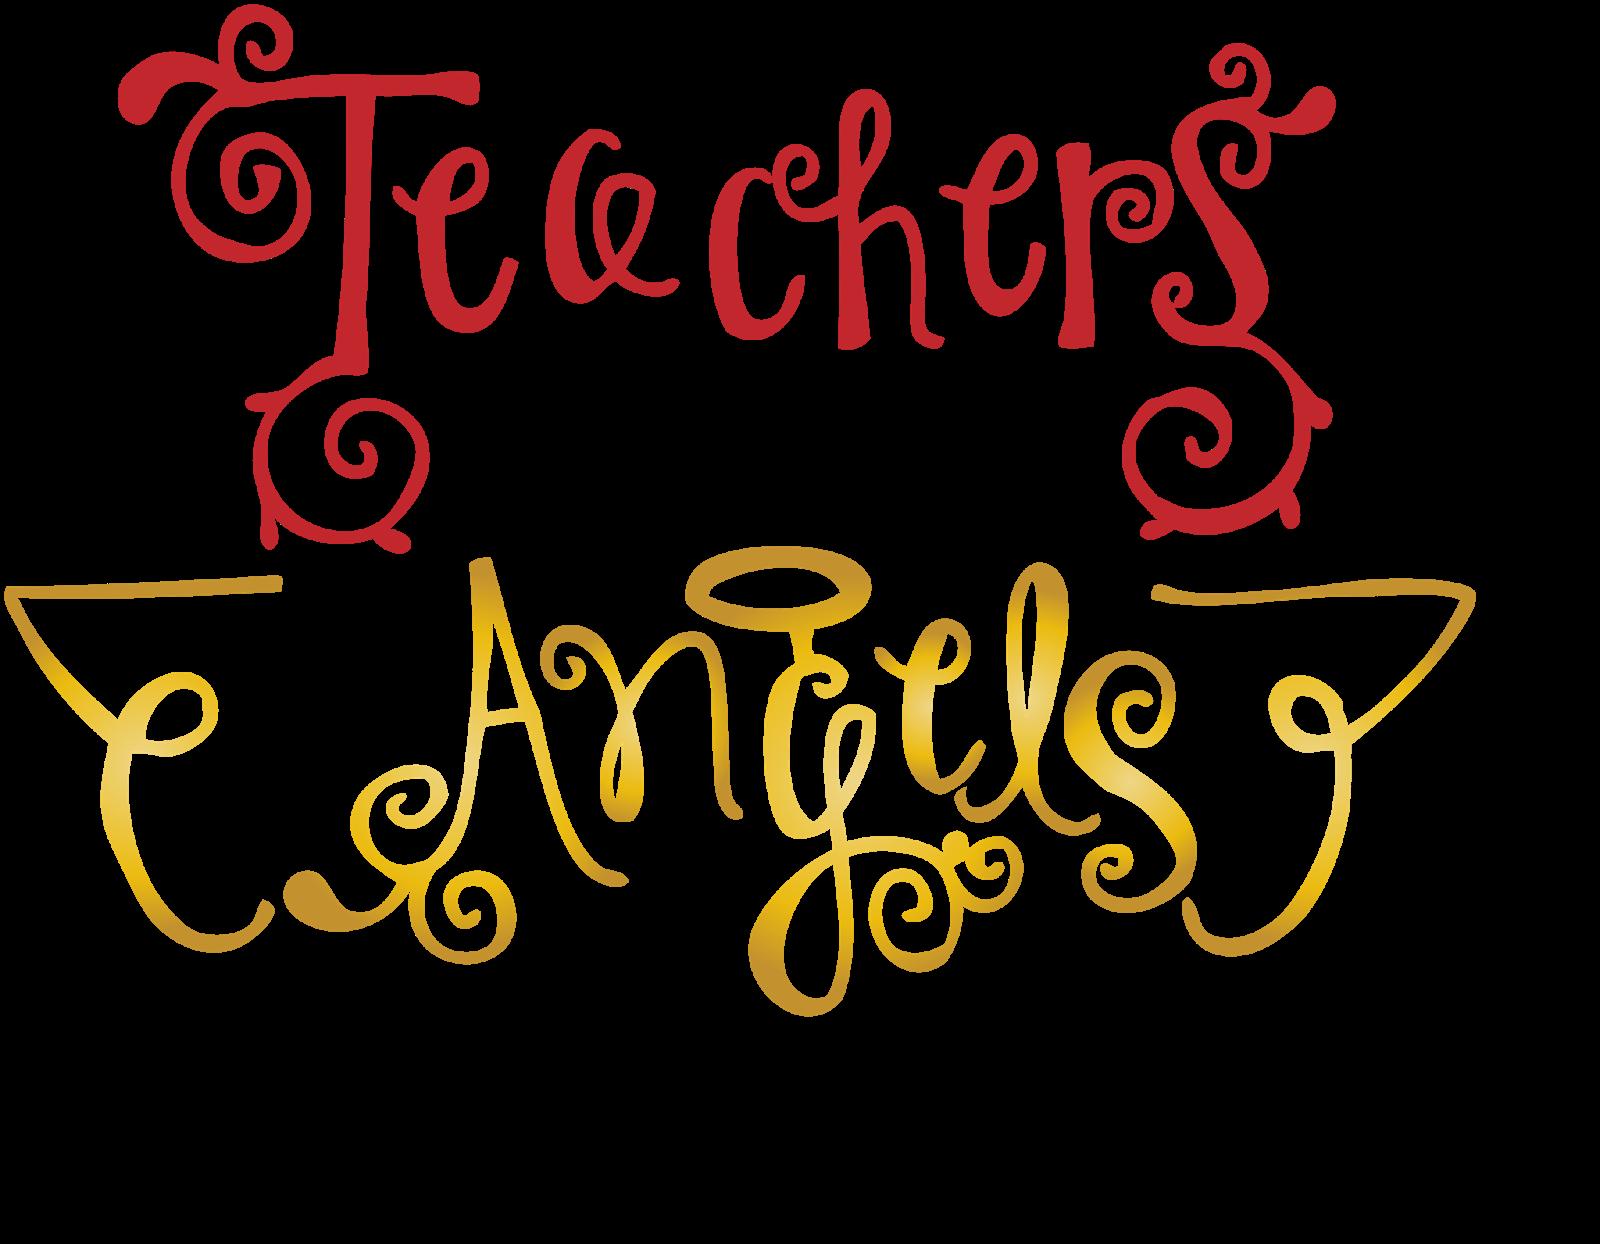 Free appreciation cliparts download. Number 1 clipart teacher